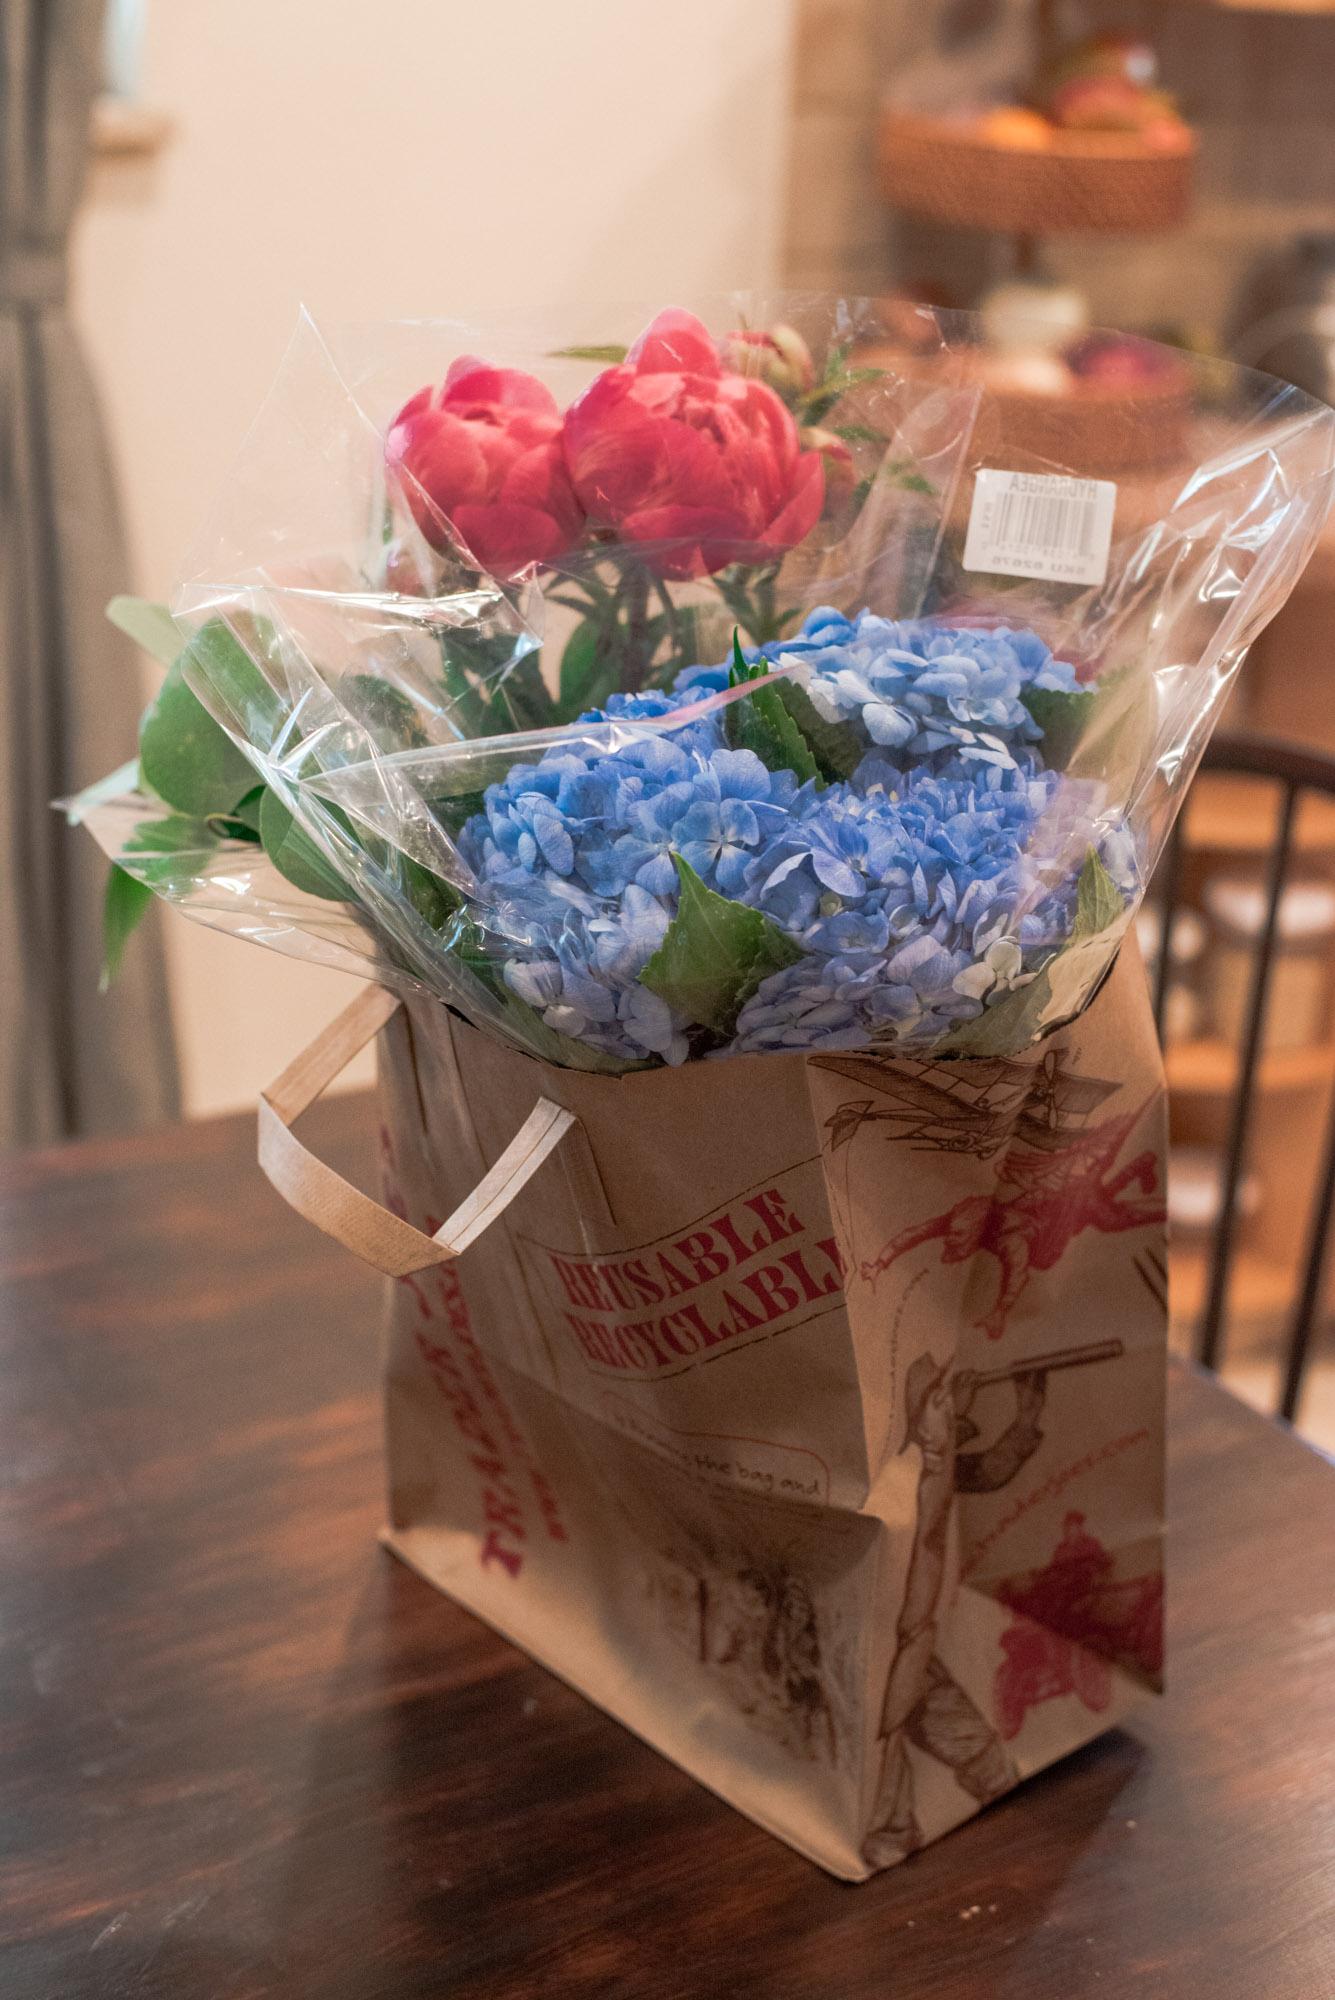 Grocery Store Flowers in trader joes bag